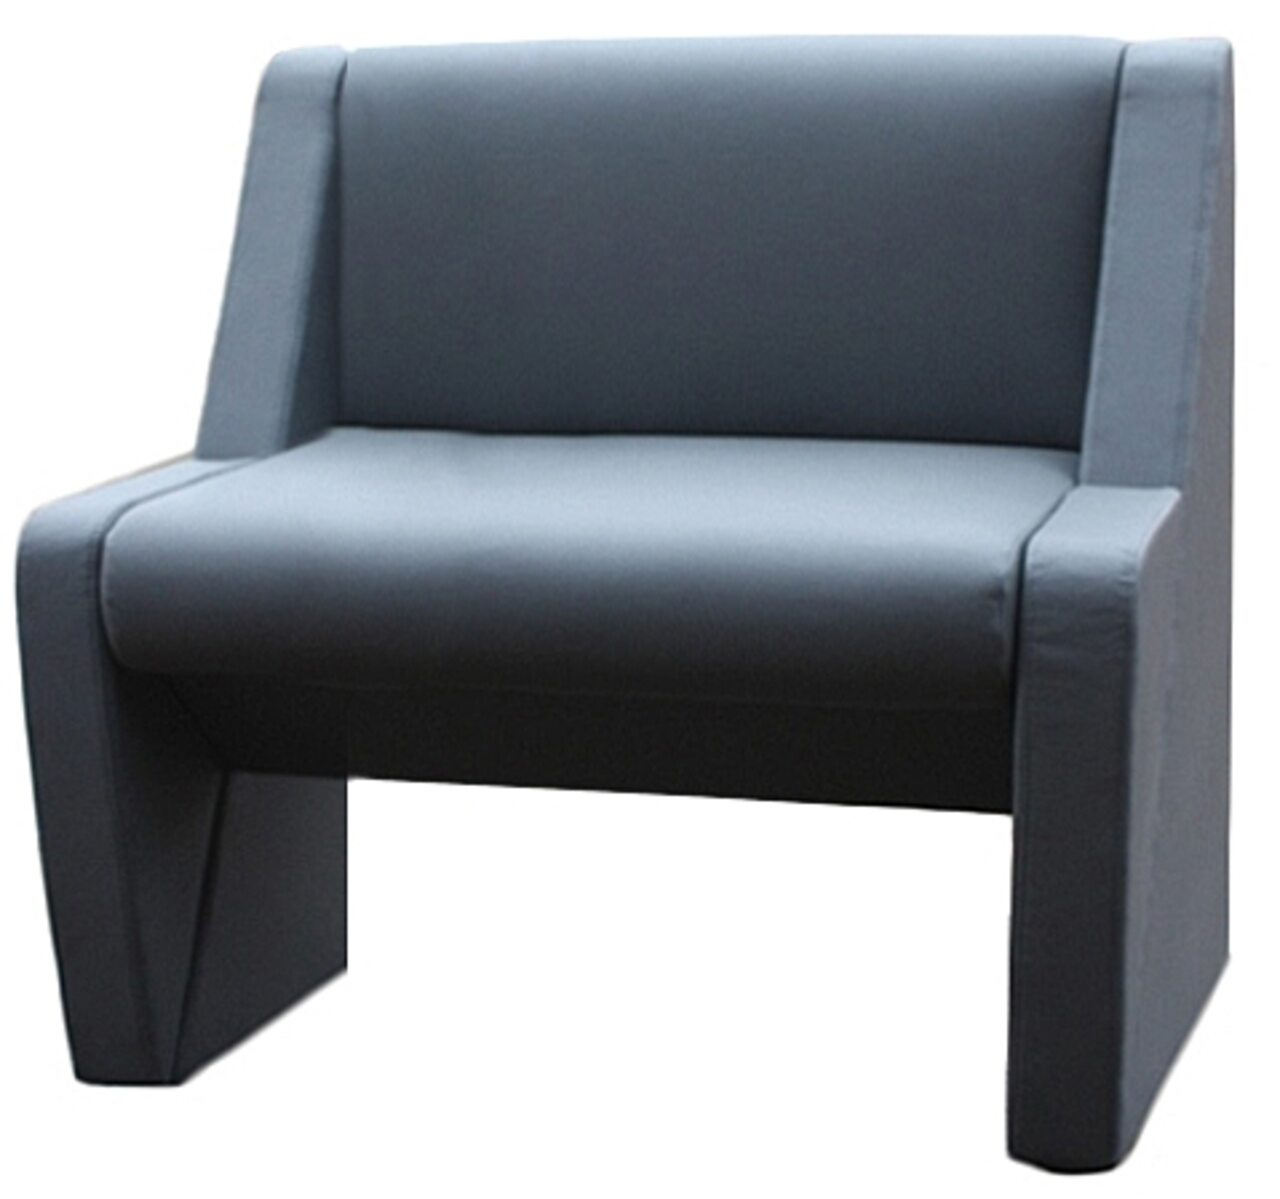 A-07 кресло для отдыха  А-07 Осло 70x58x88 - фото 1